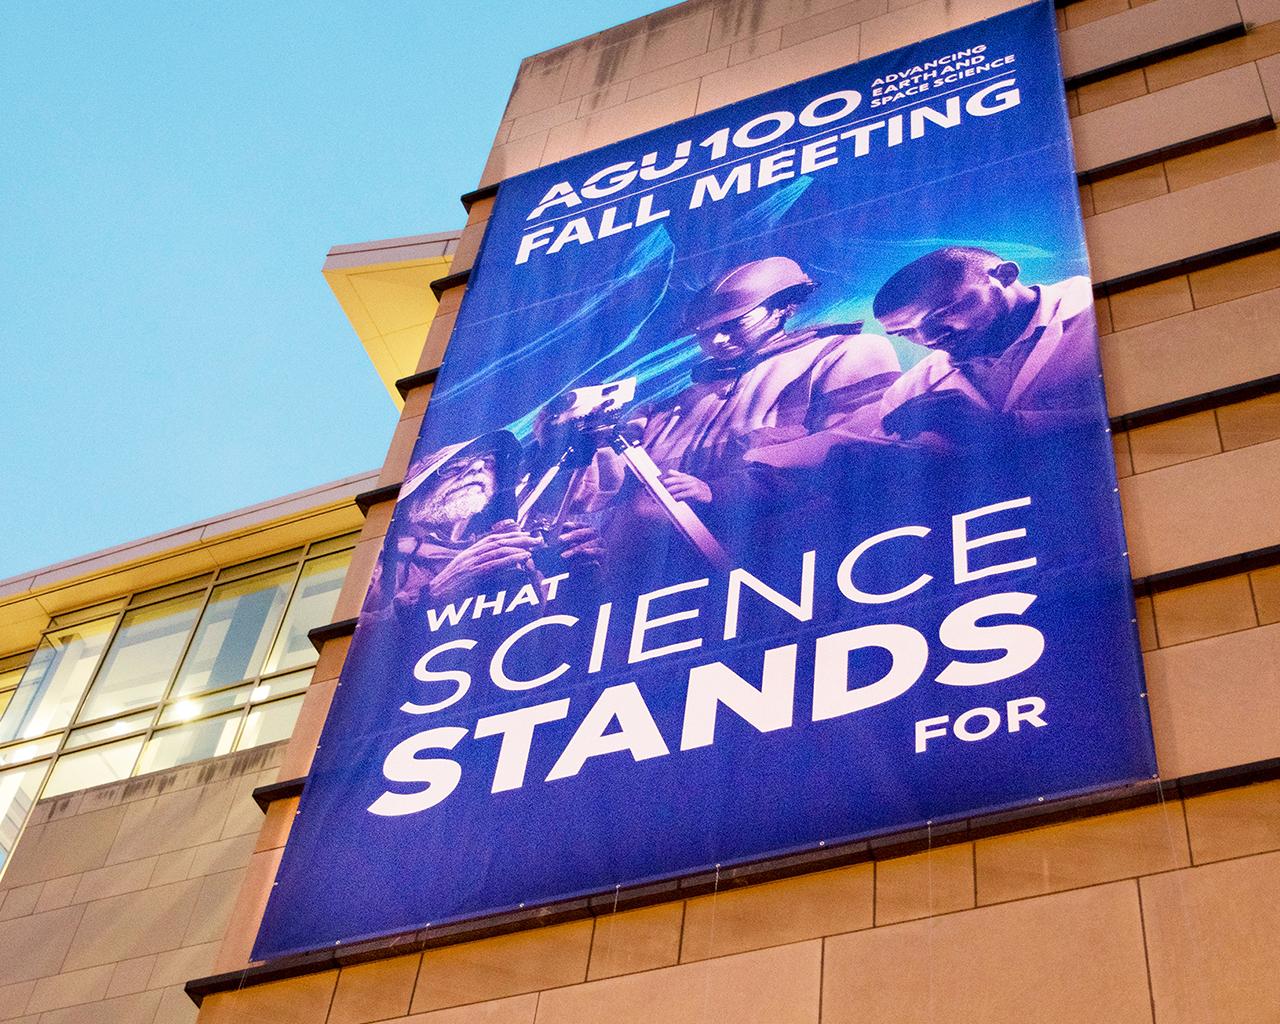 Outdoor signage promoting AGU Fall Meeting 2019